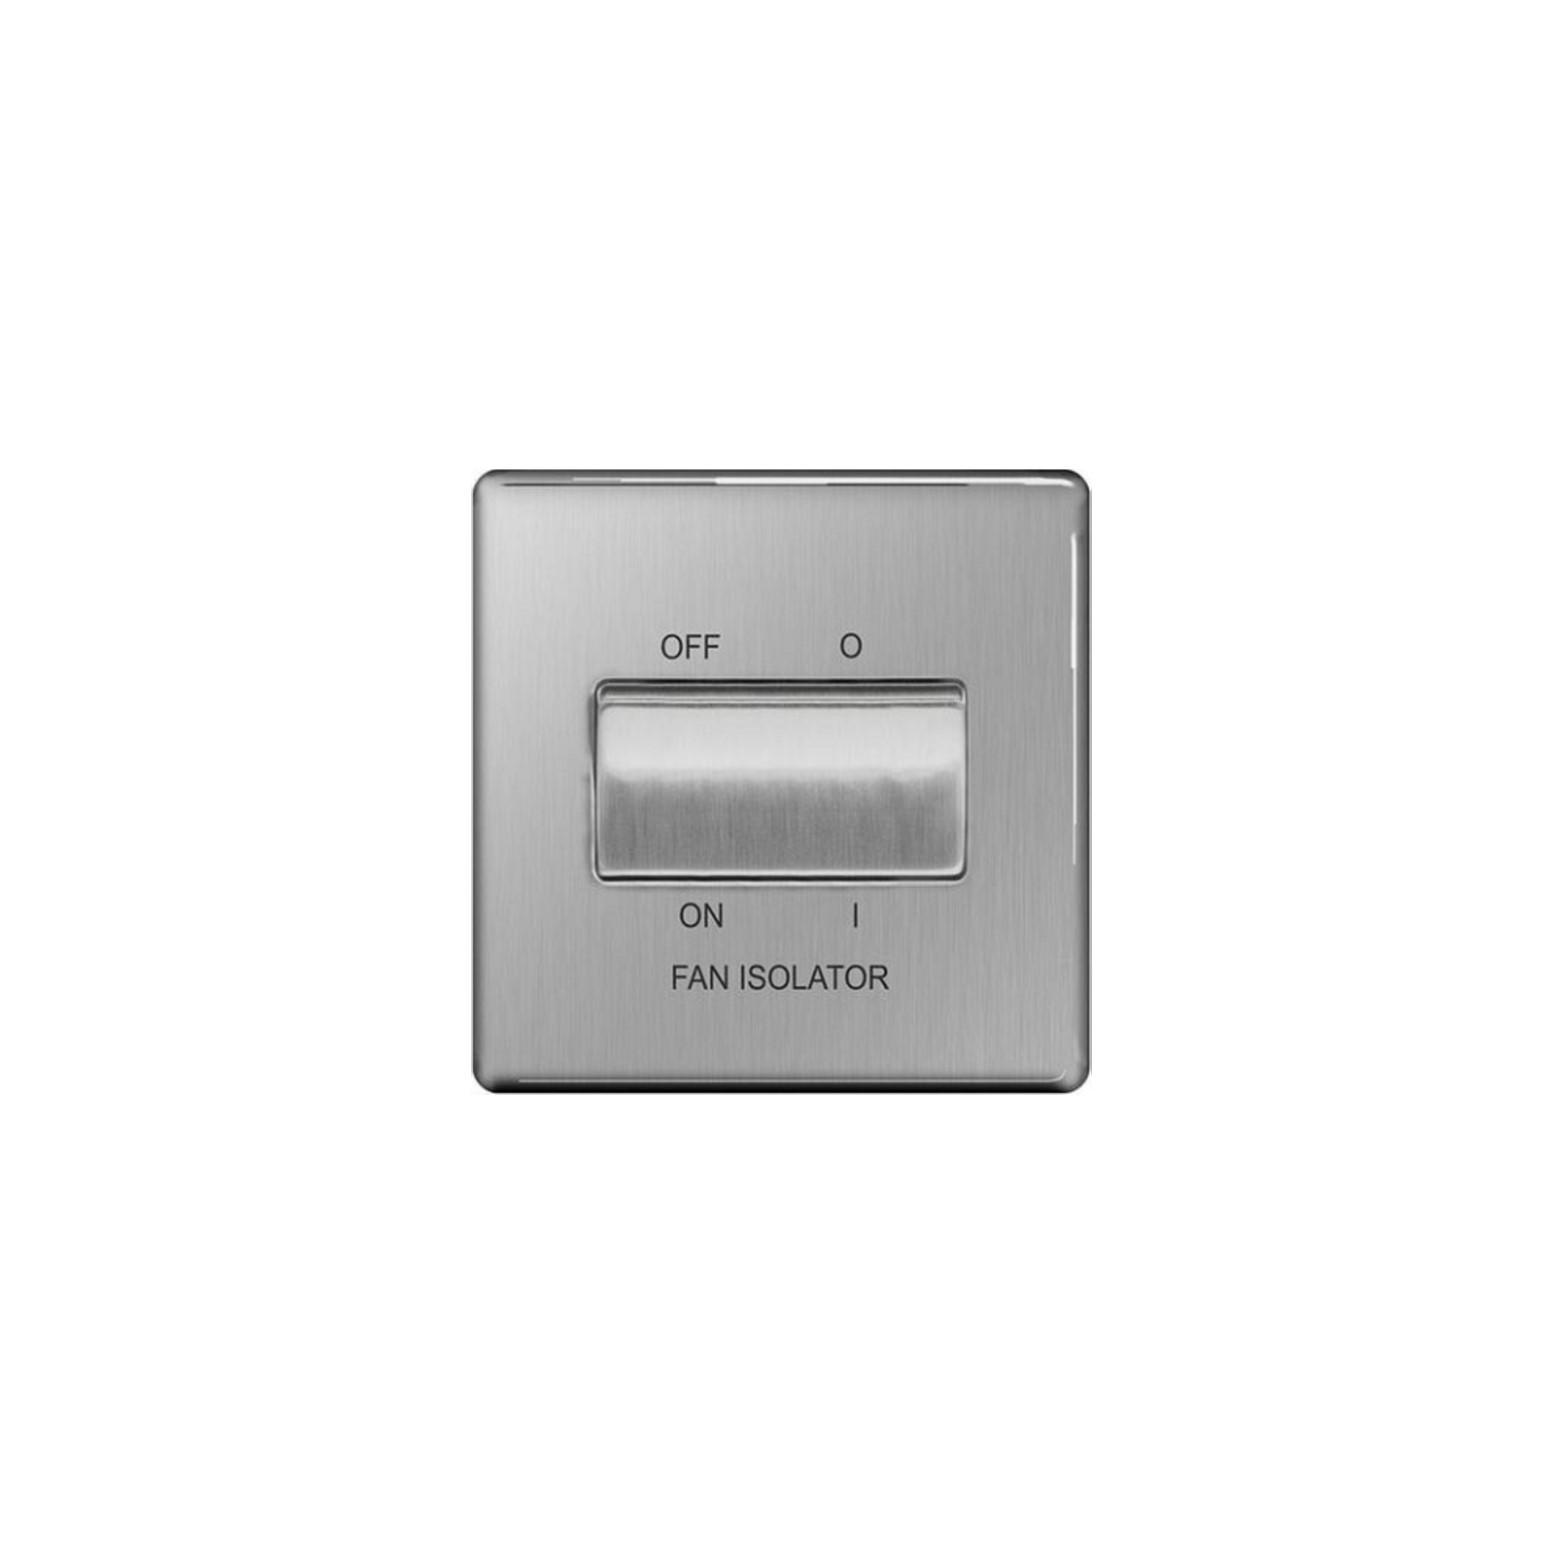 BG - 10AX三極風扇關開插座/蘇底-拉絲鋼色 (型號 : FBS15)